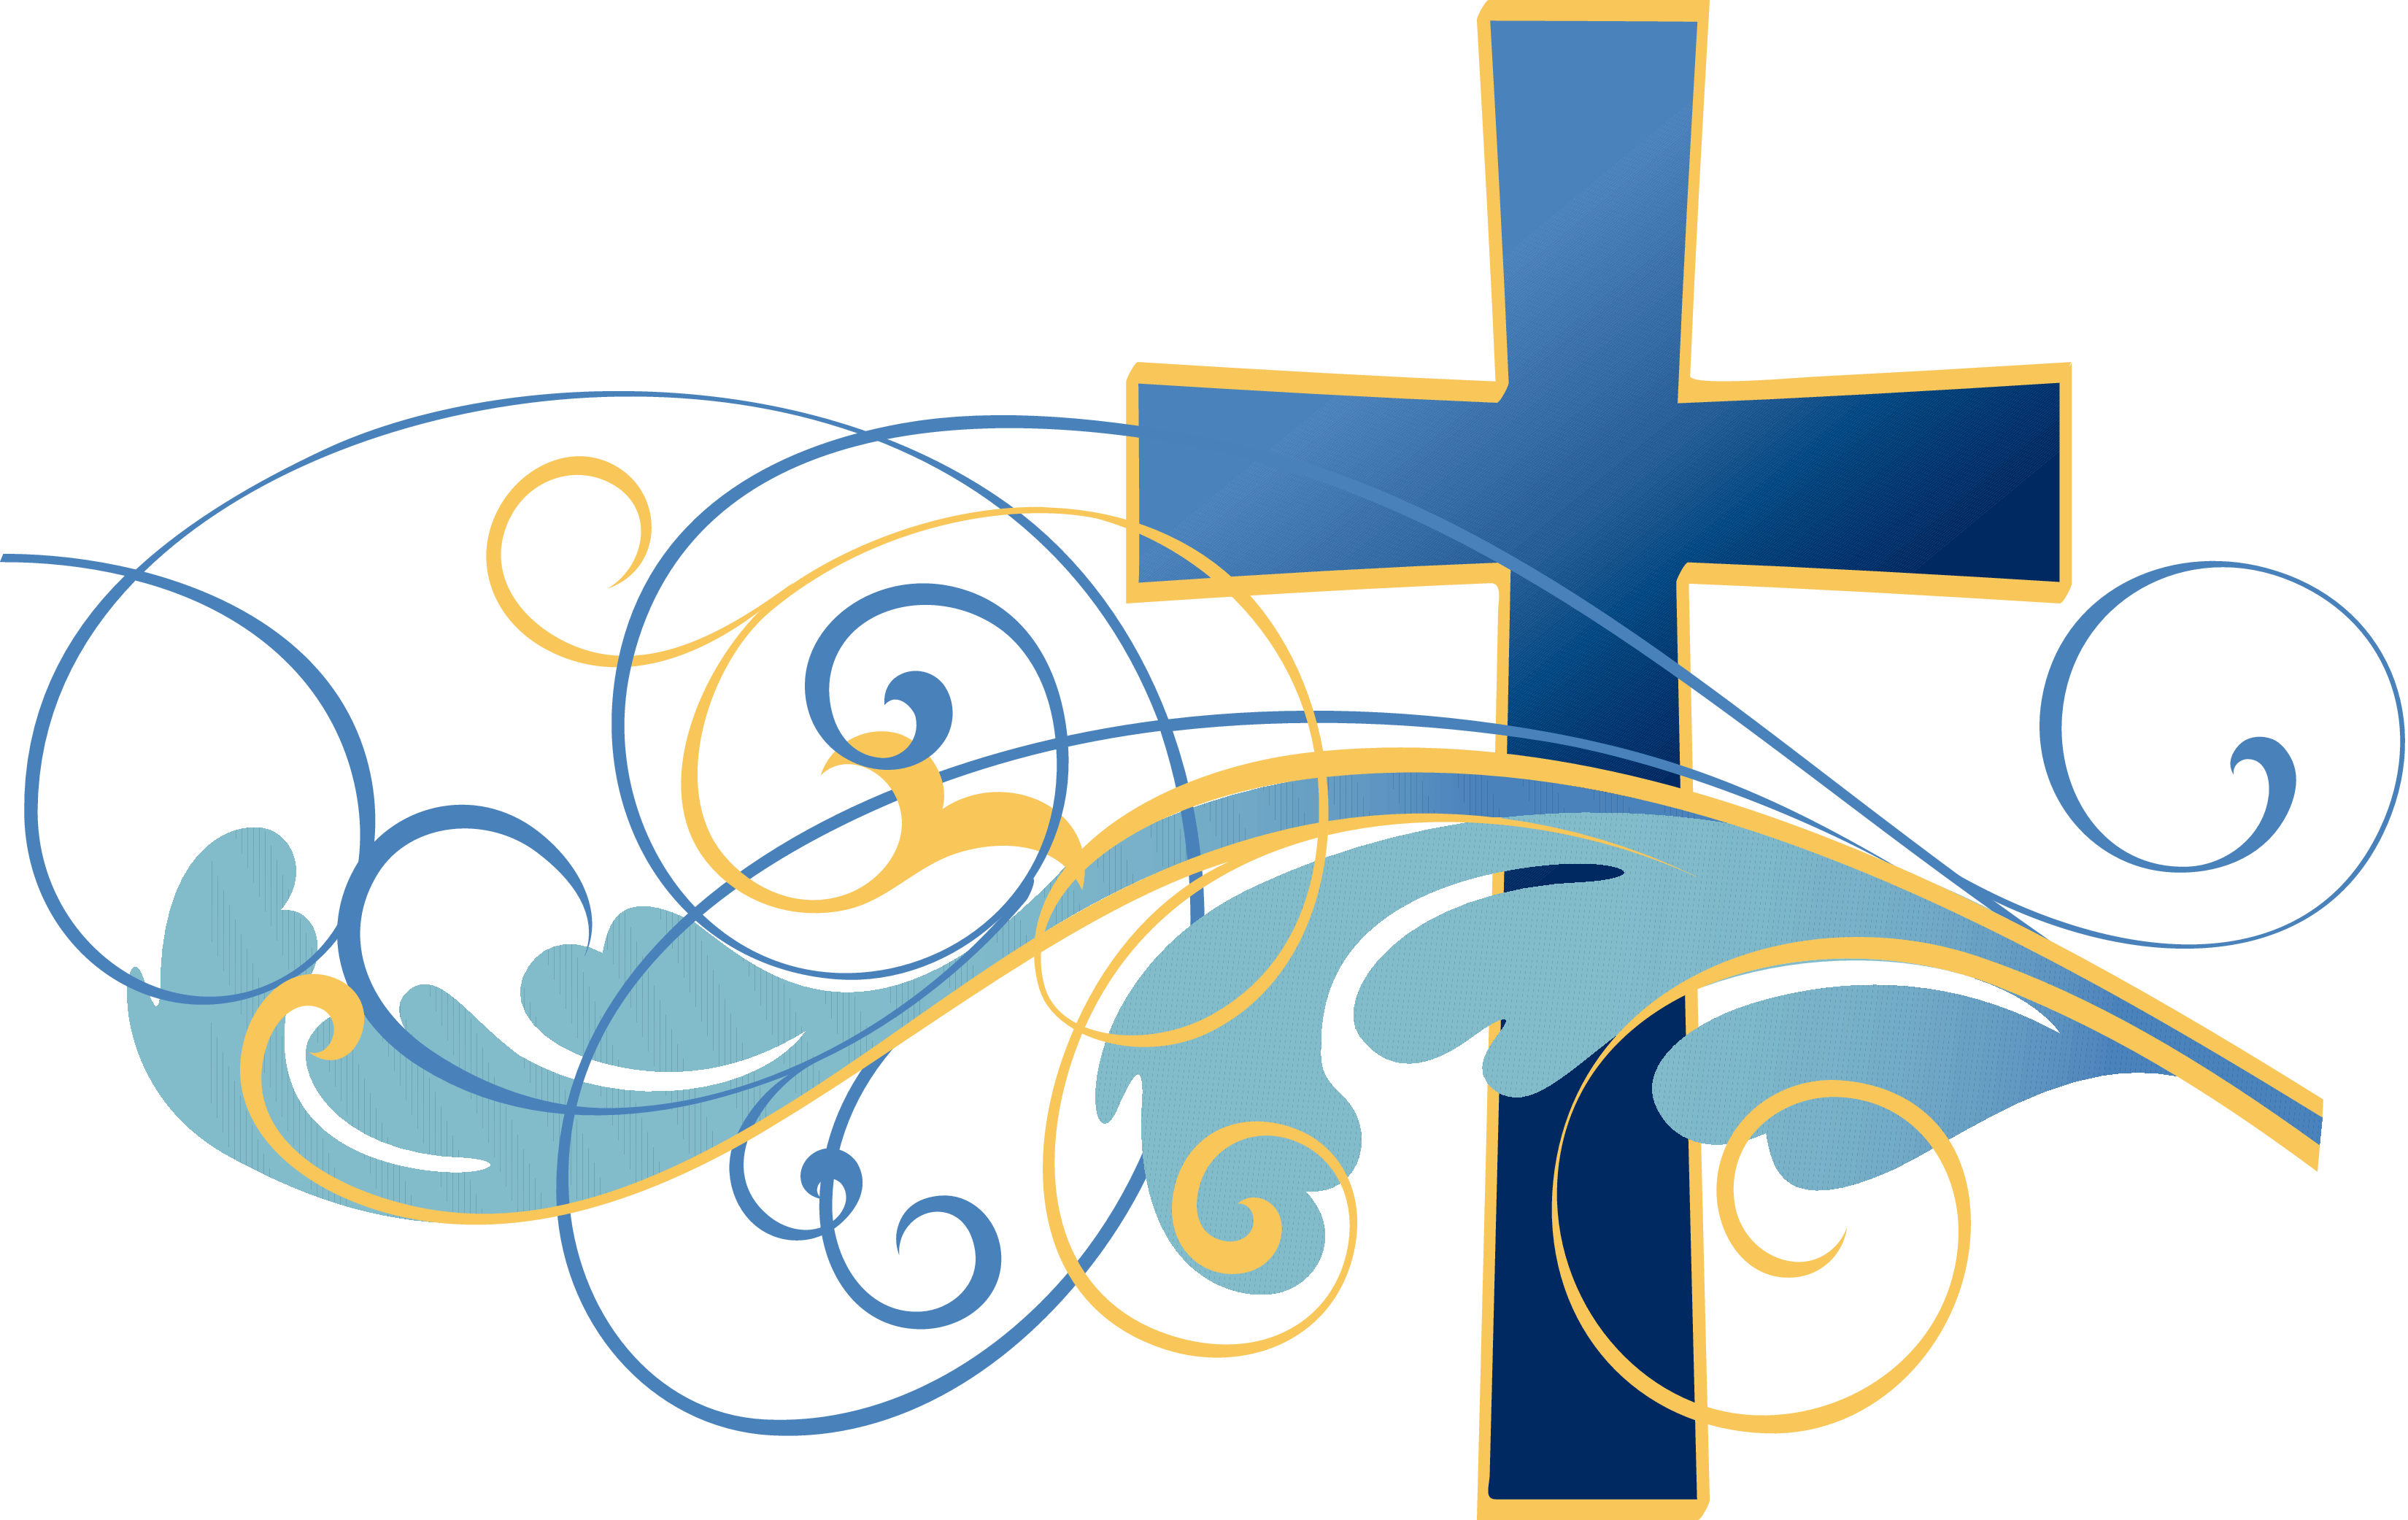 Ordination anniversary clipart.